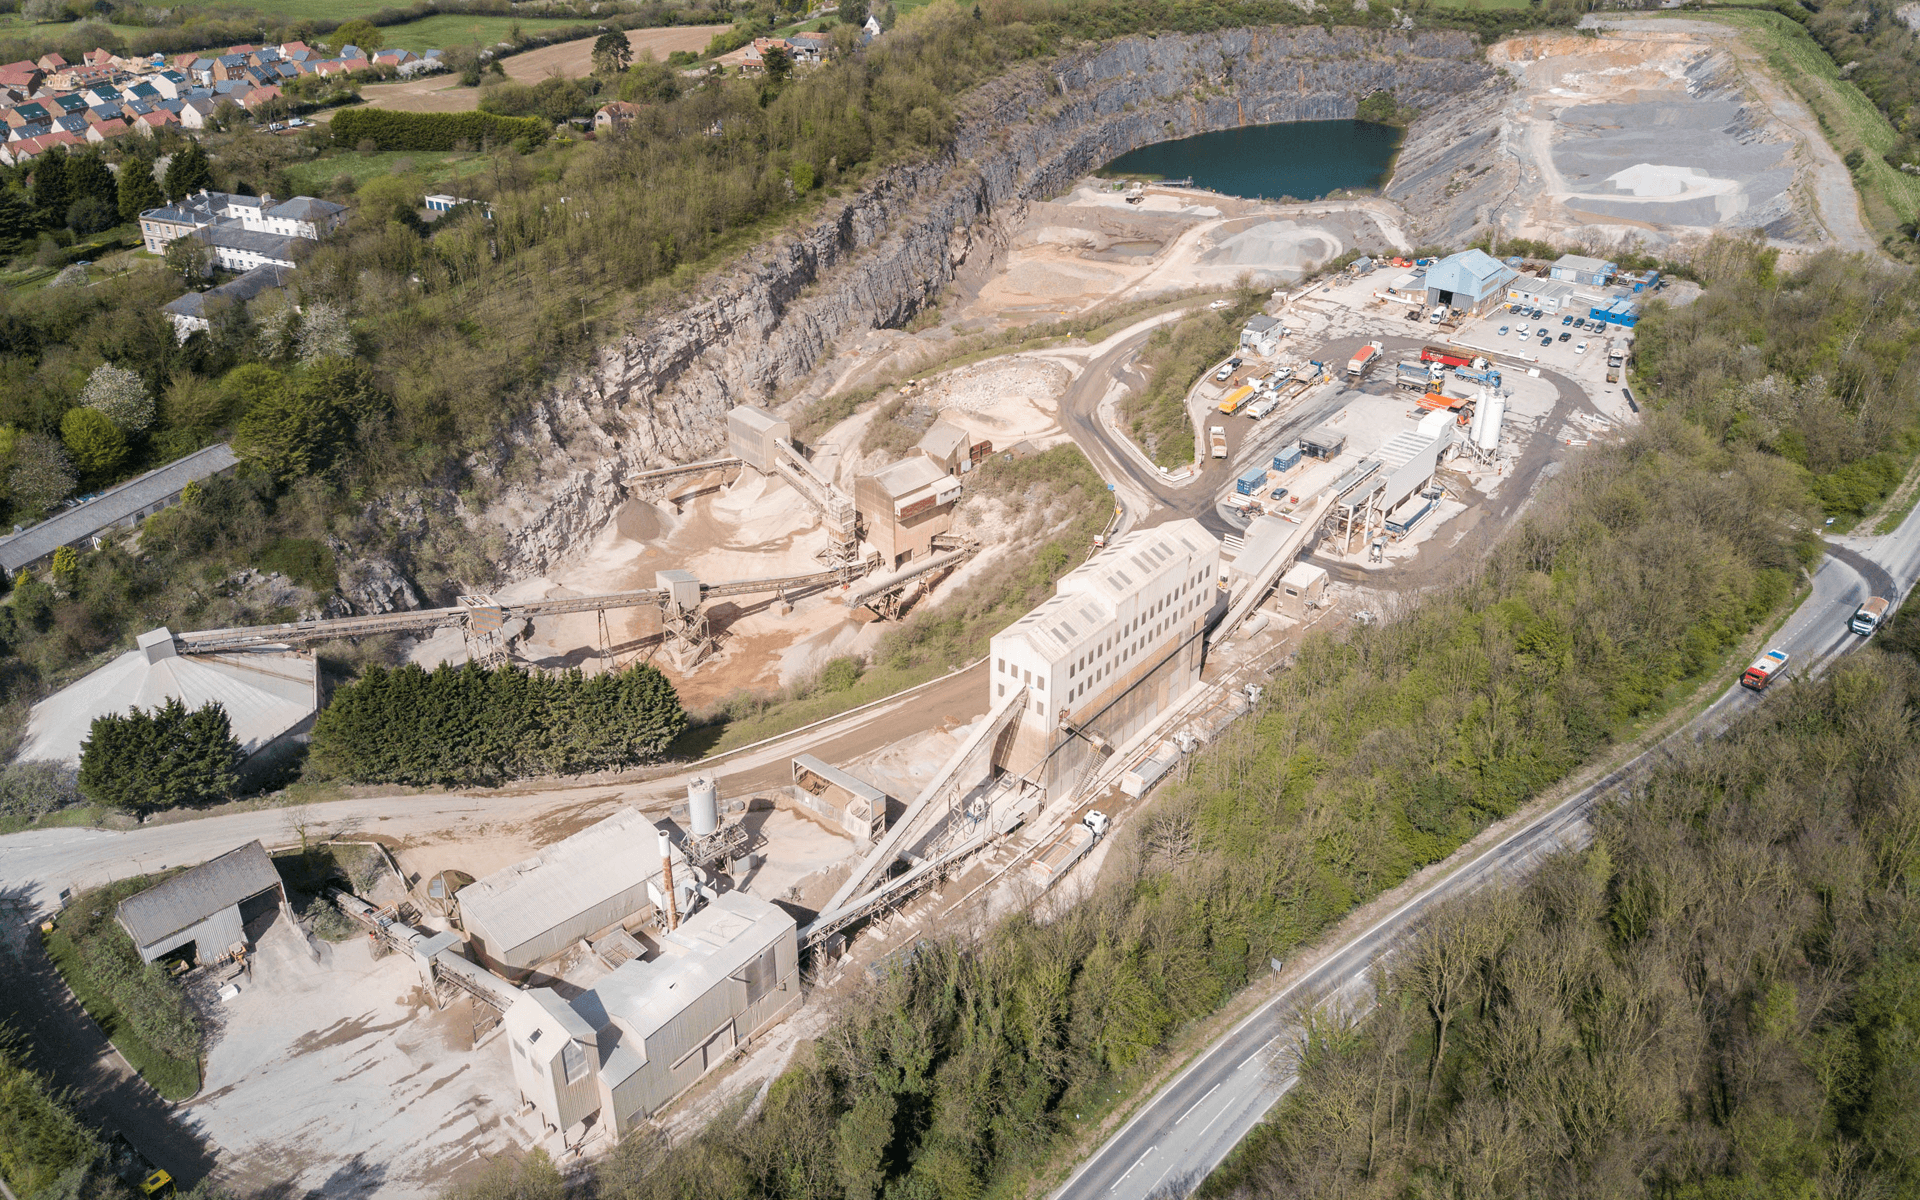 """Mavic Pro"" aerial drone photo of ""Hanson Aggregates"" quarry in Chipping Sodbury, Bristol"